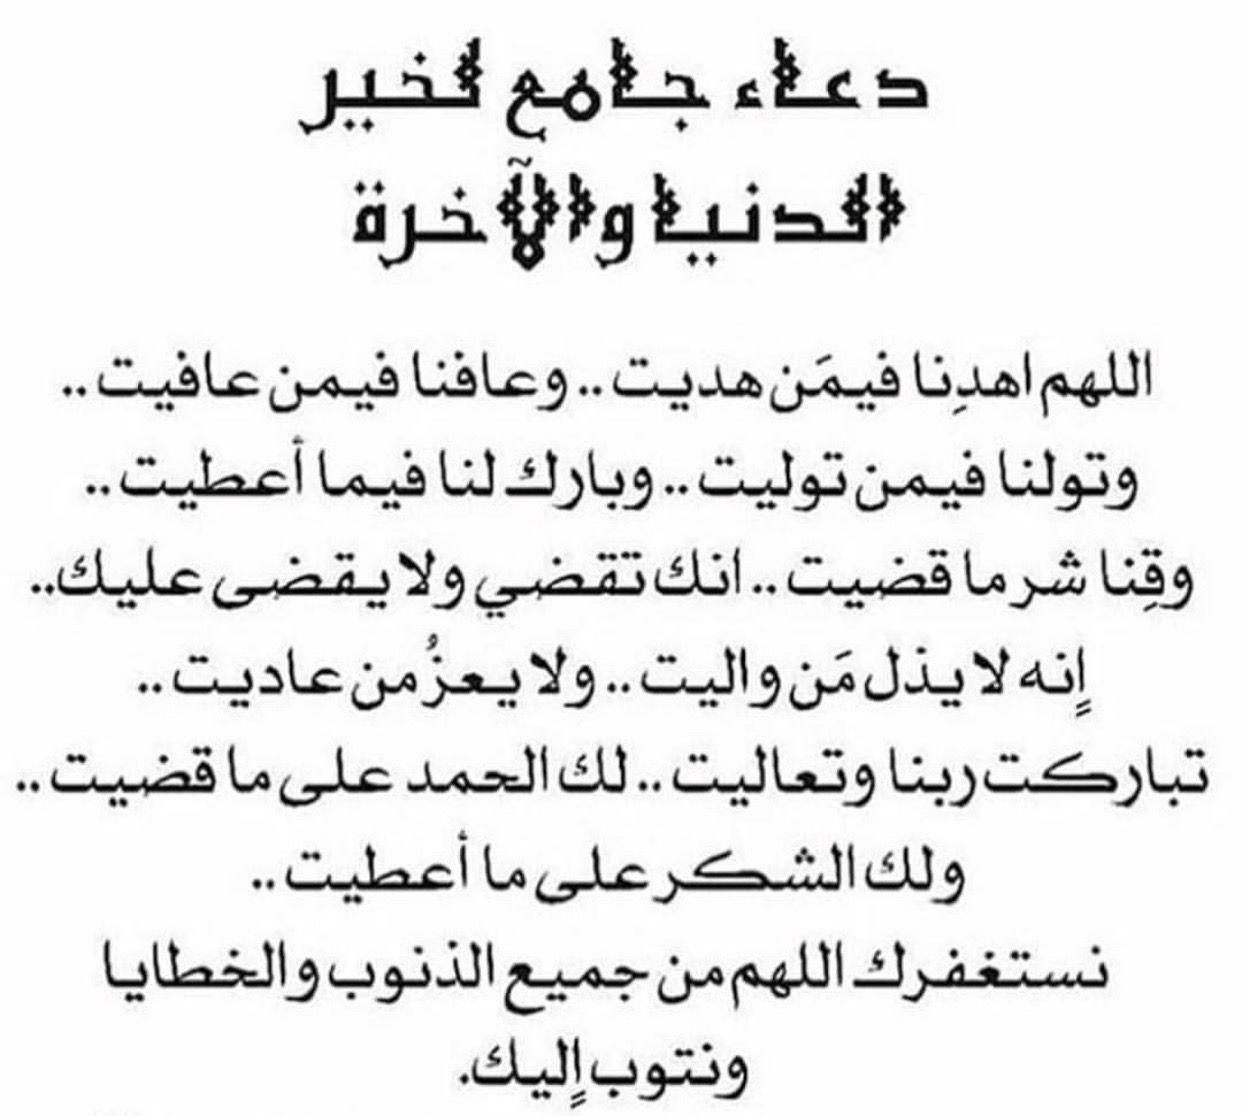 مواعظ الحسنة Islamic Quotes Quotes Positive Notes